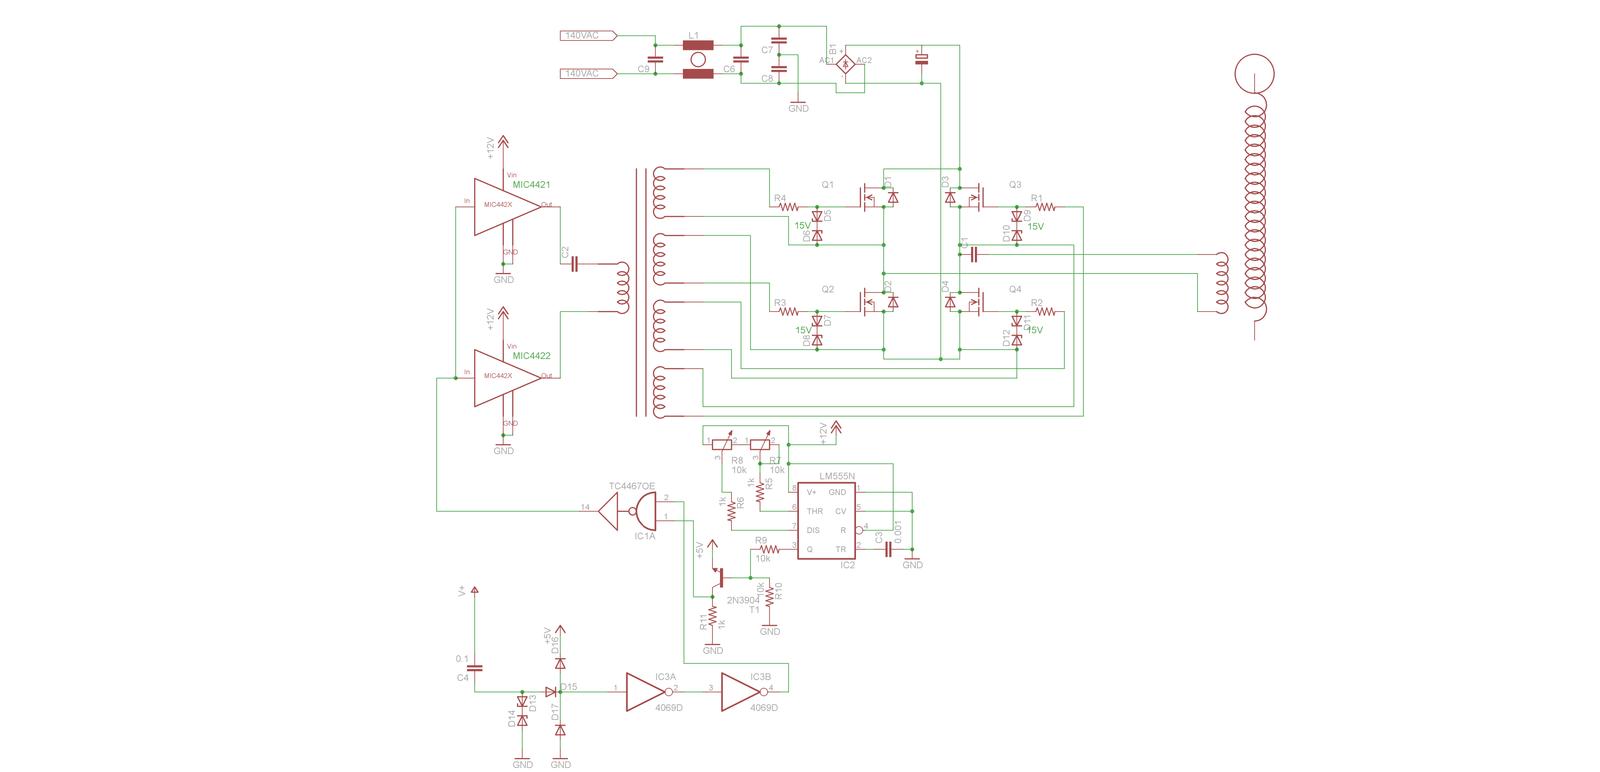 sstc plans beta by biozz on deviantart